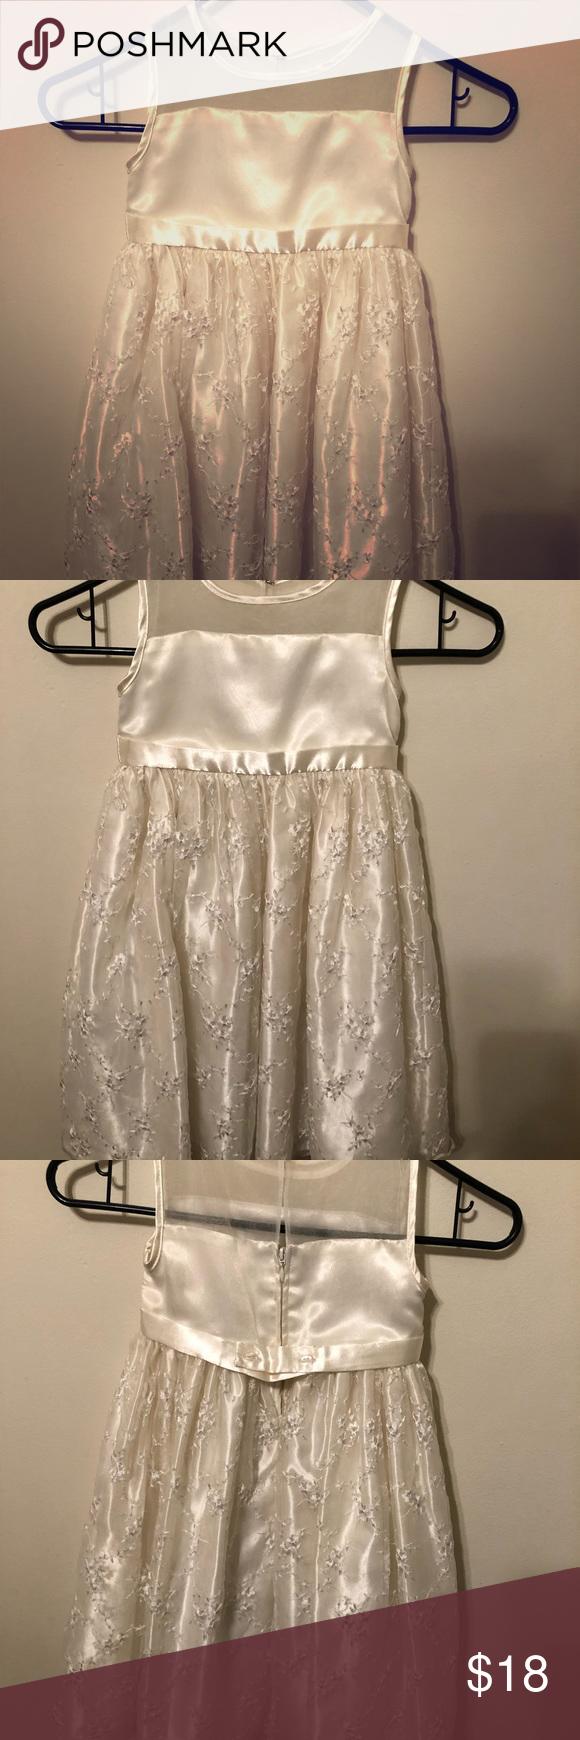 Dress Girls White Dress Dresses Cinderella Dresses [ 1740 x 580 Pixel ]